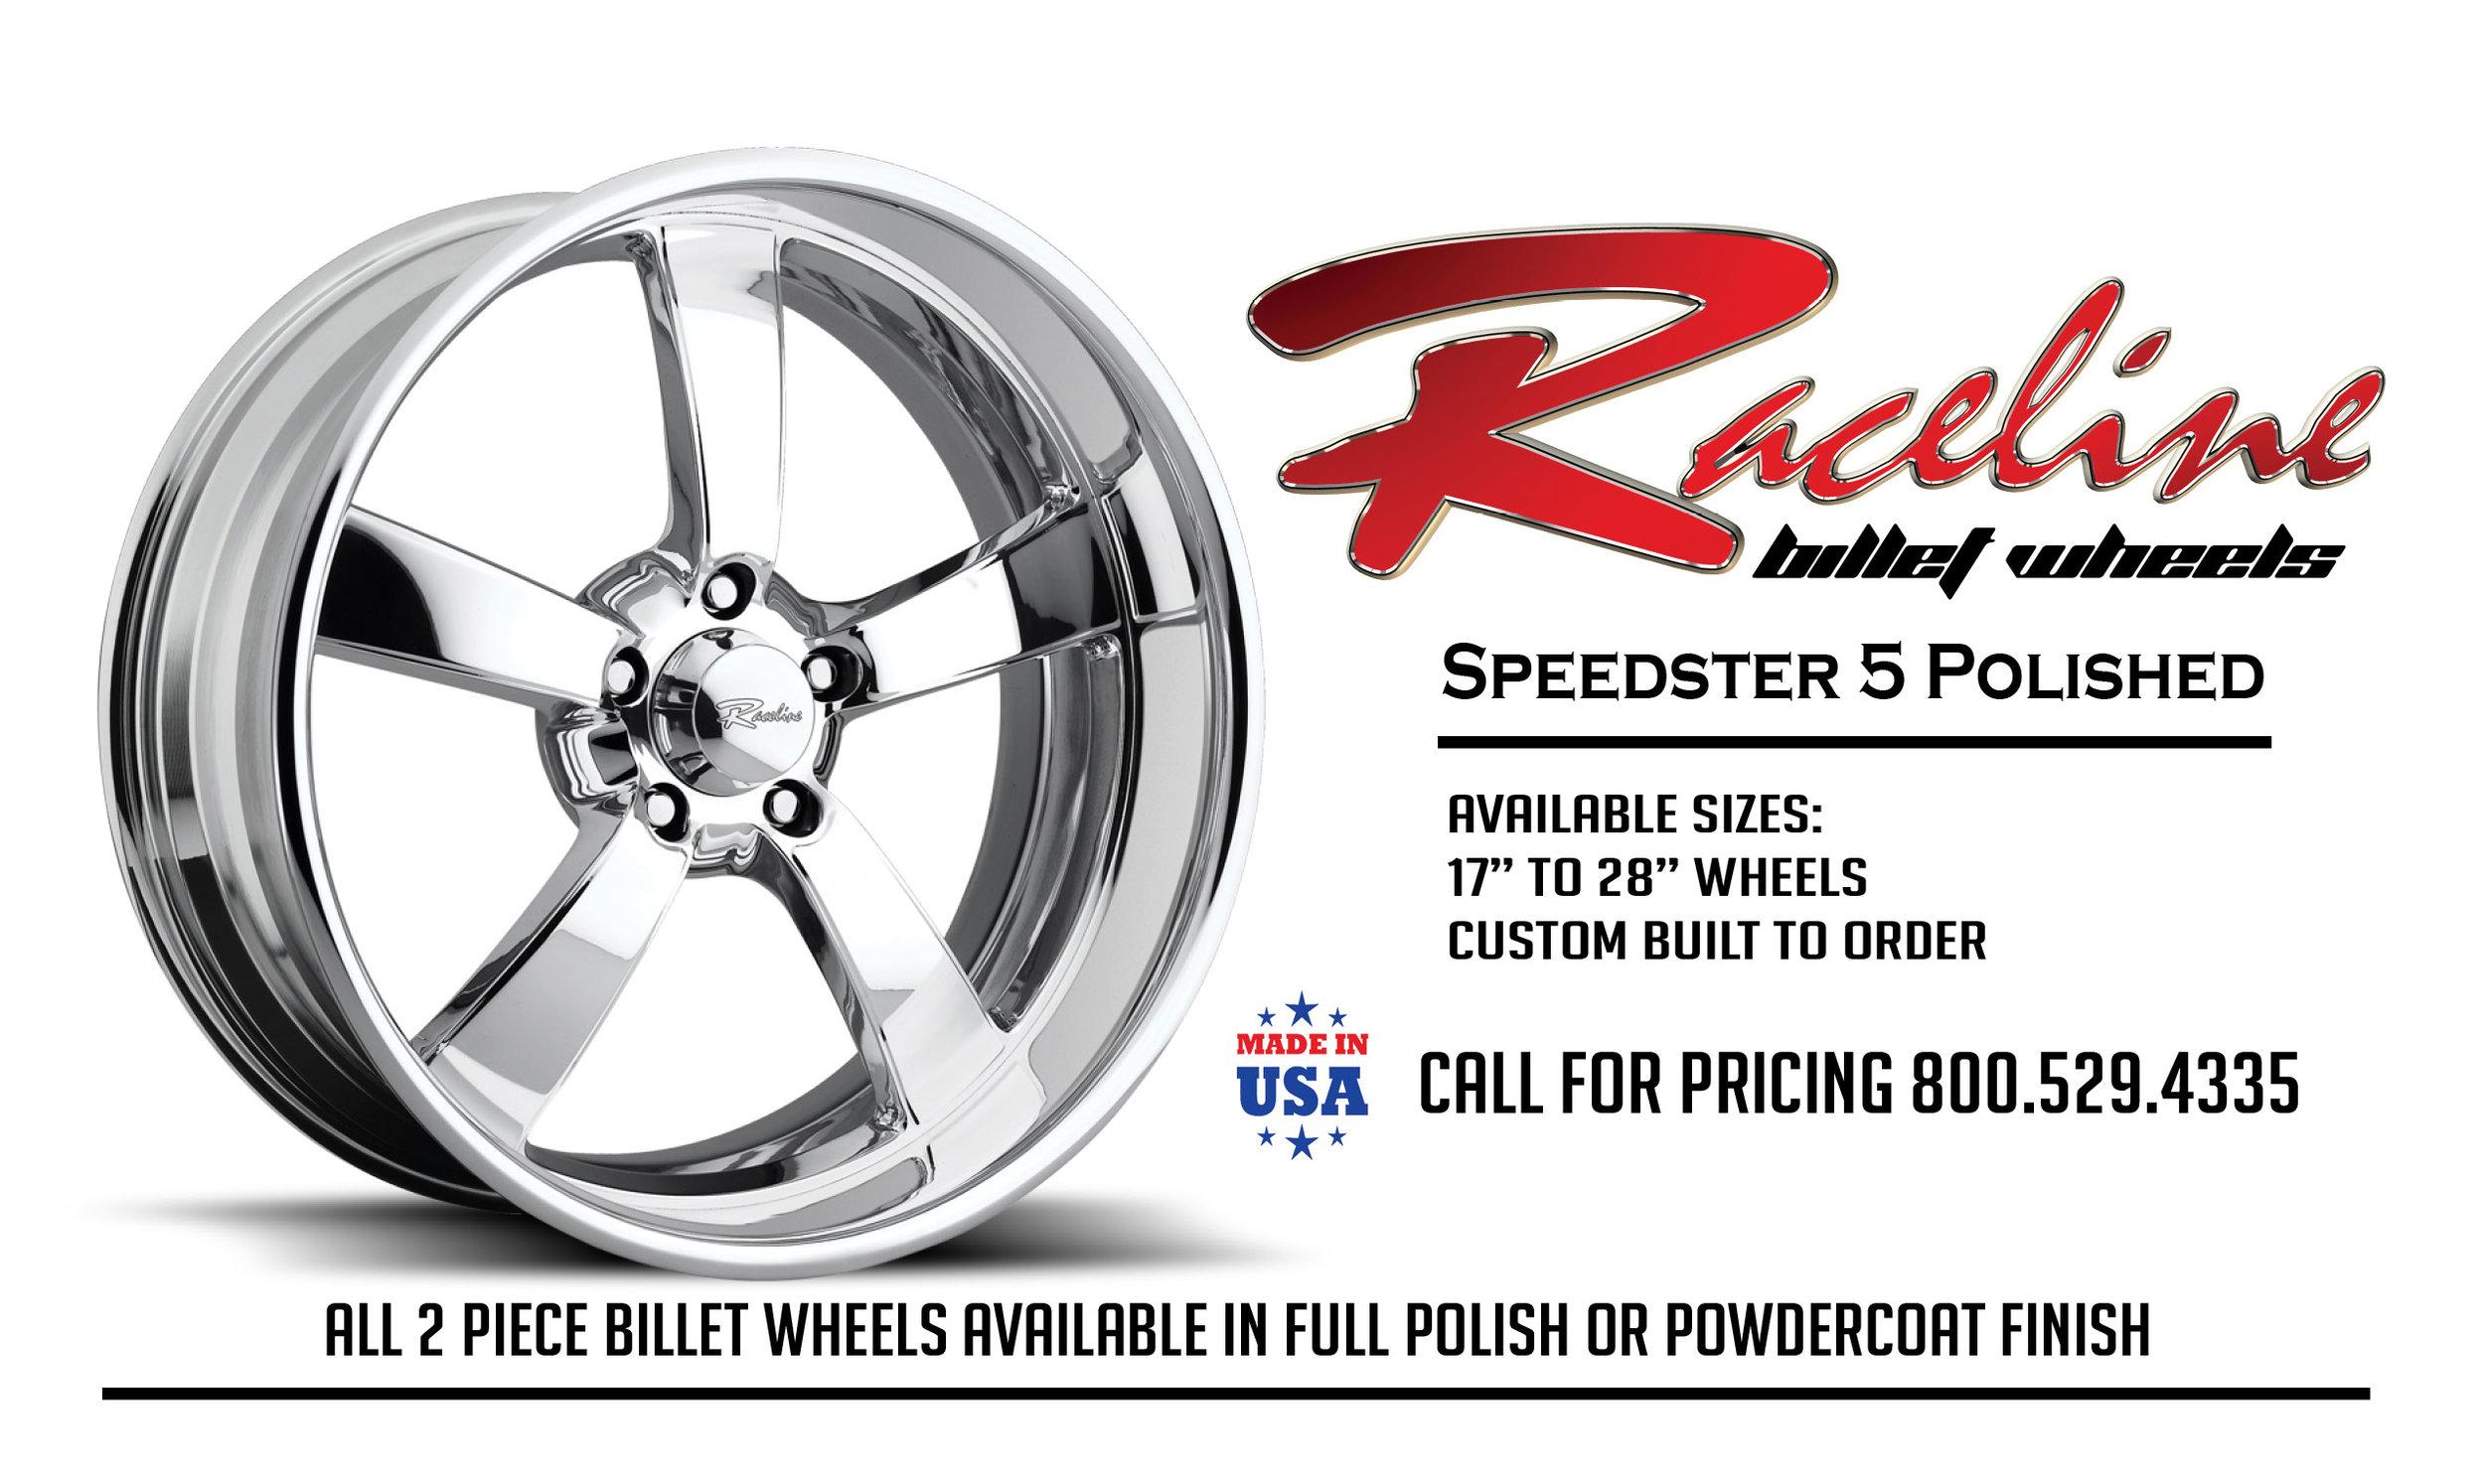 speedster 5 polish.jpg